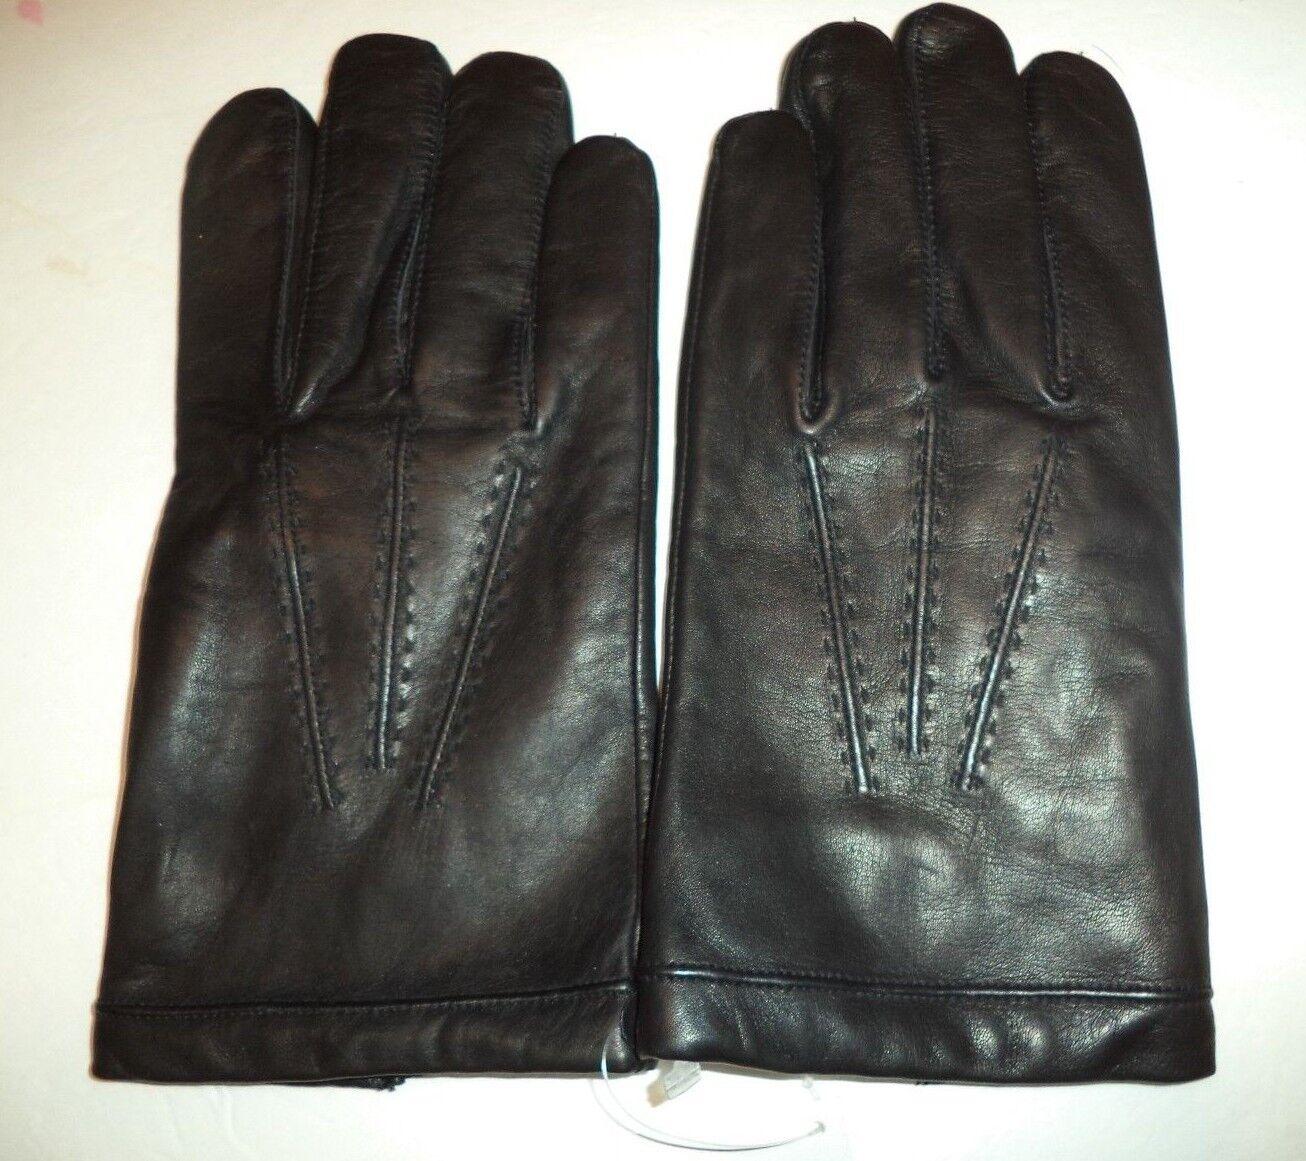 Men's Grandoe Genuine Leather Gloves,Black, Large Style 776